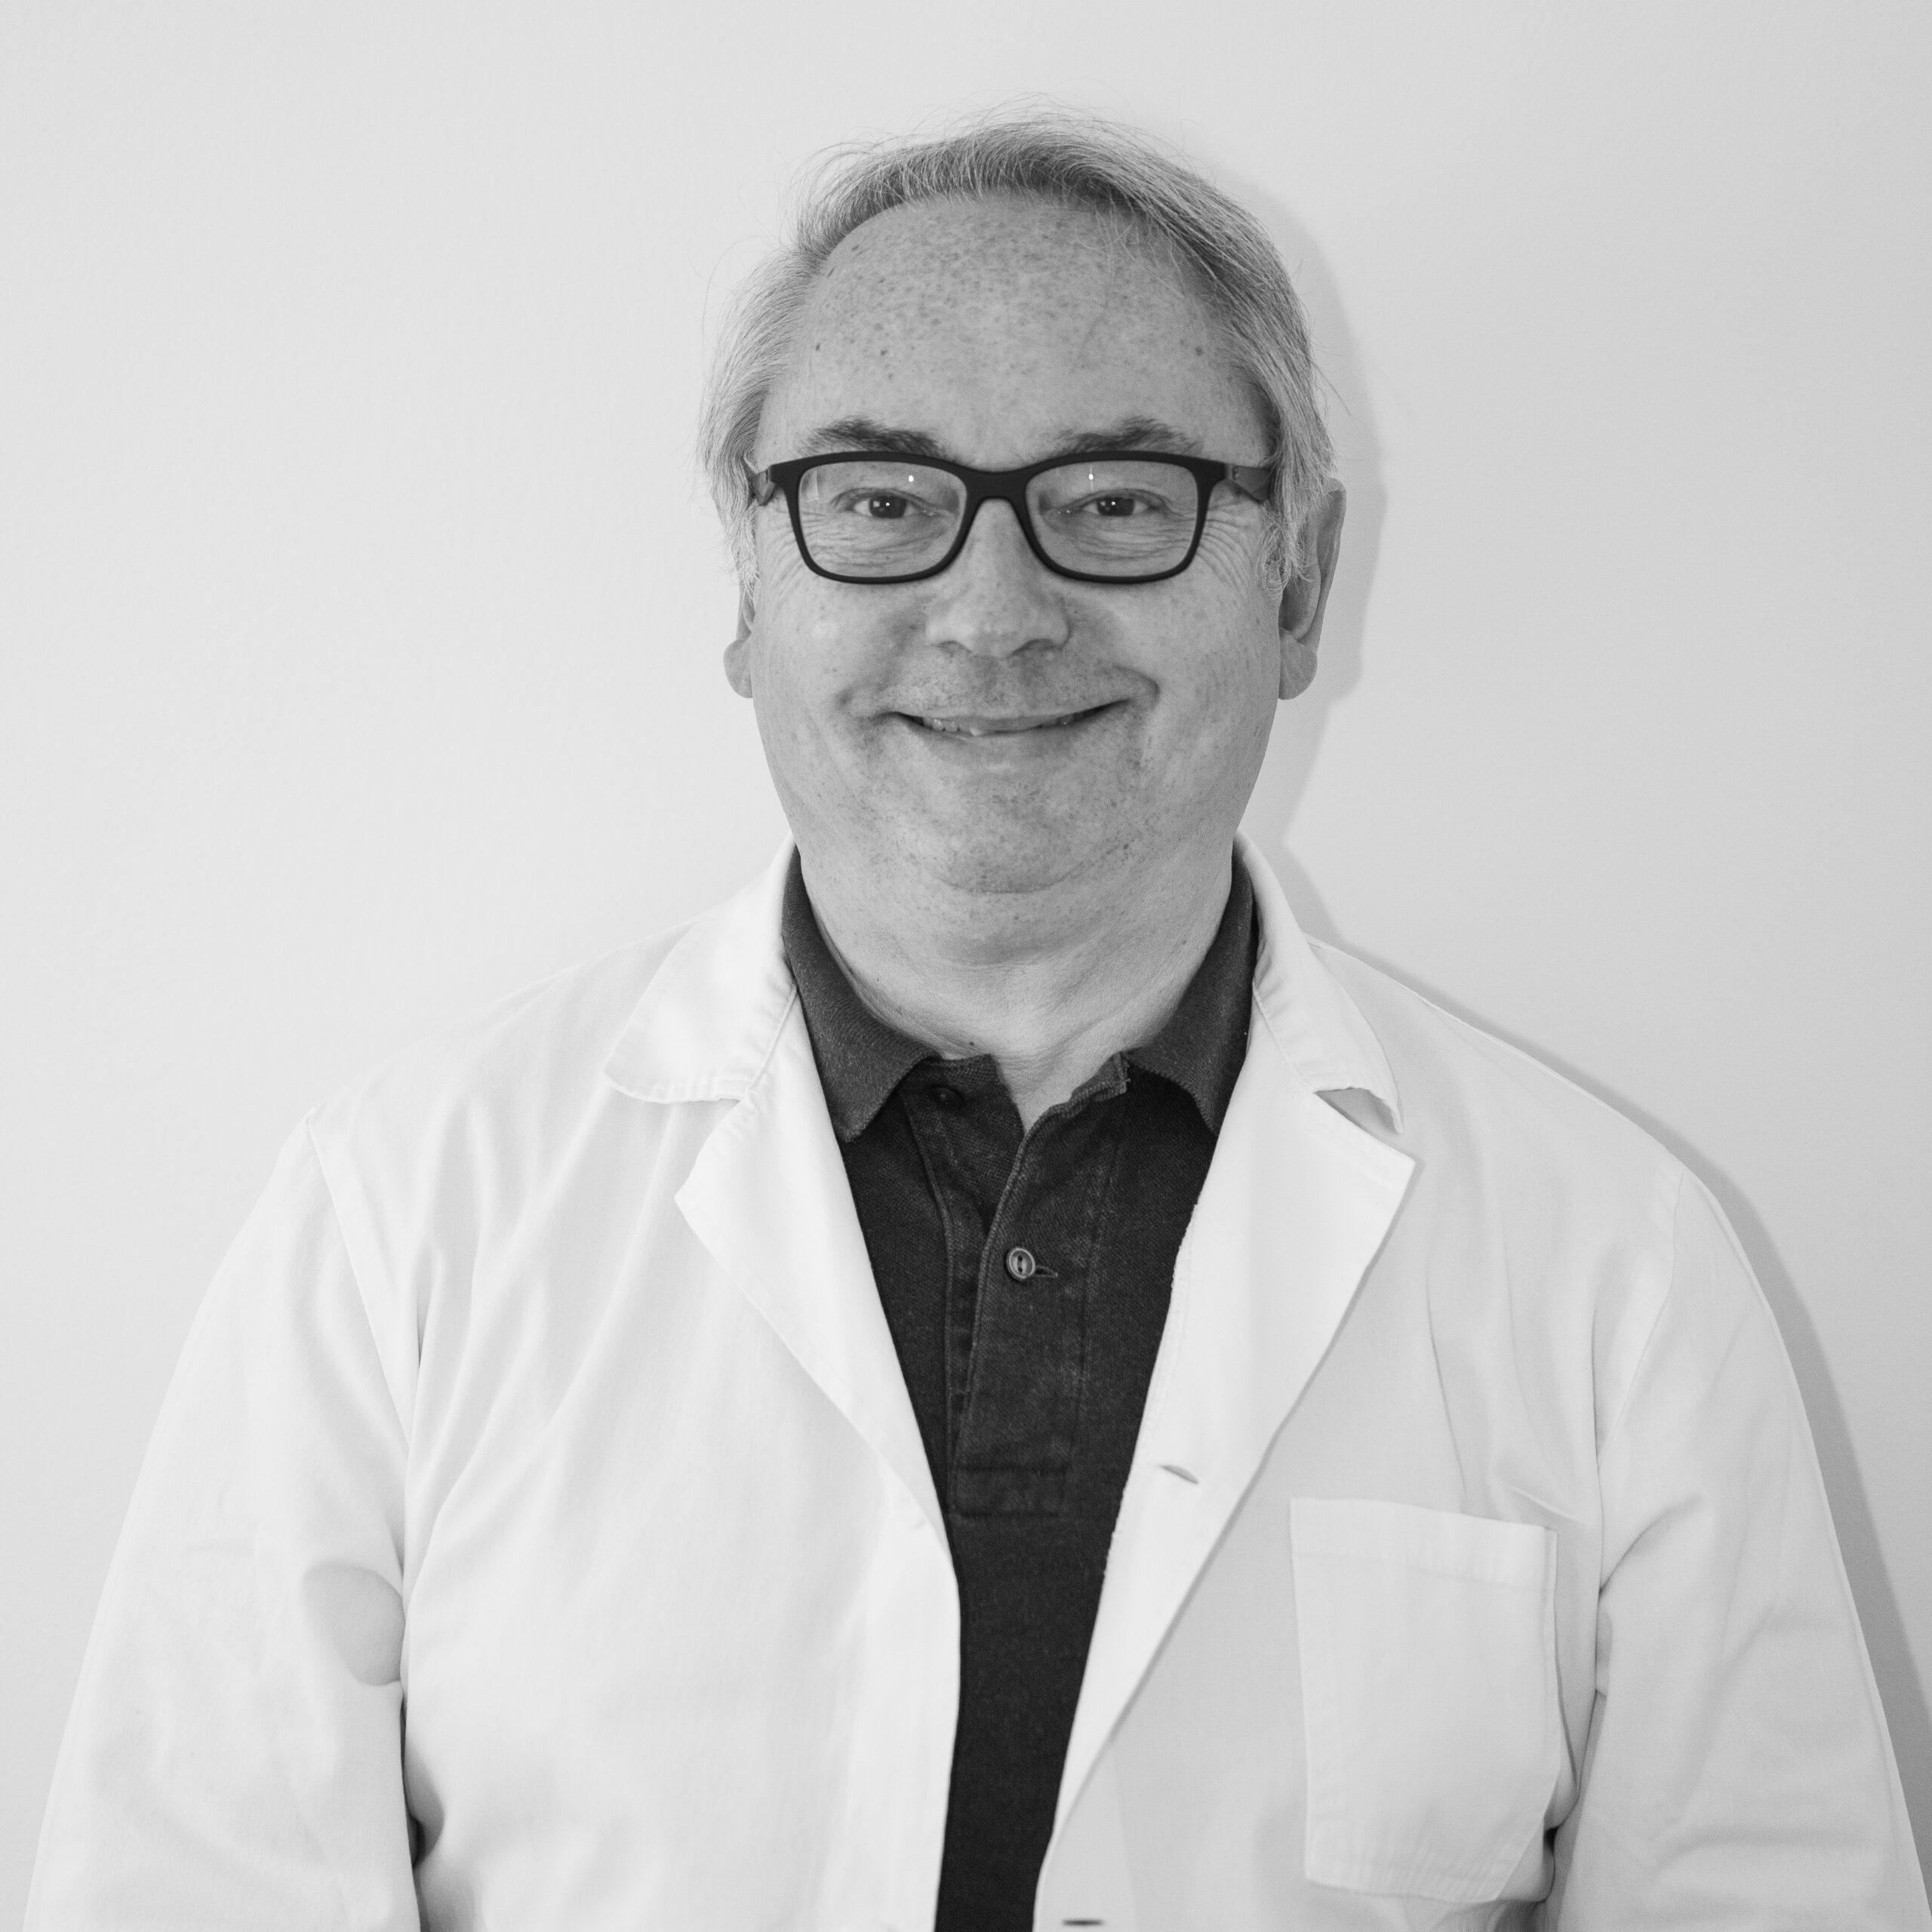 Dr. C. Gibbone